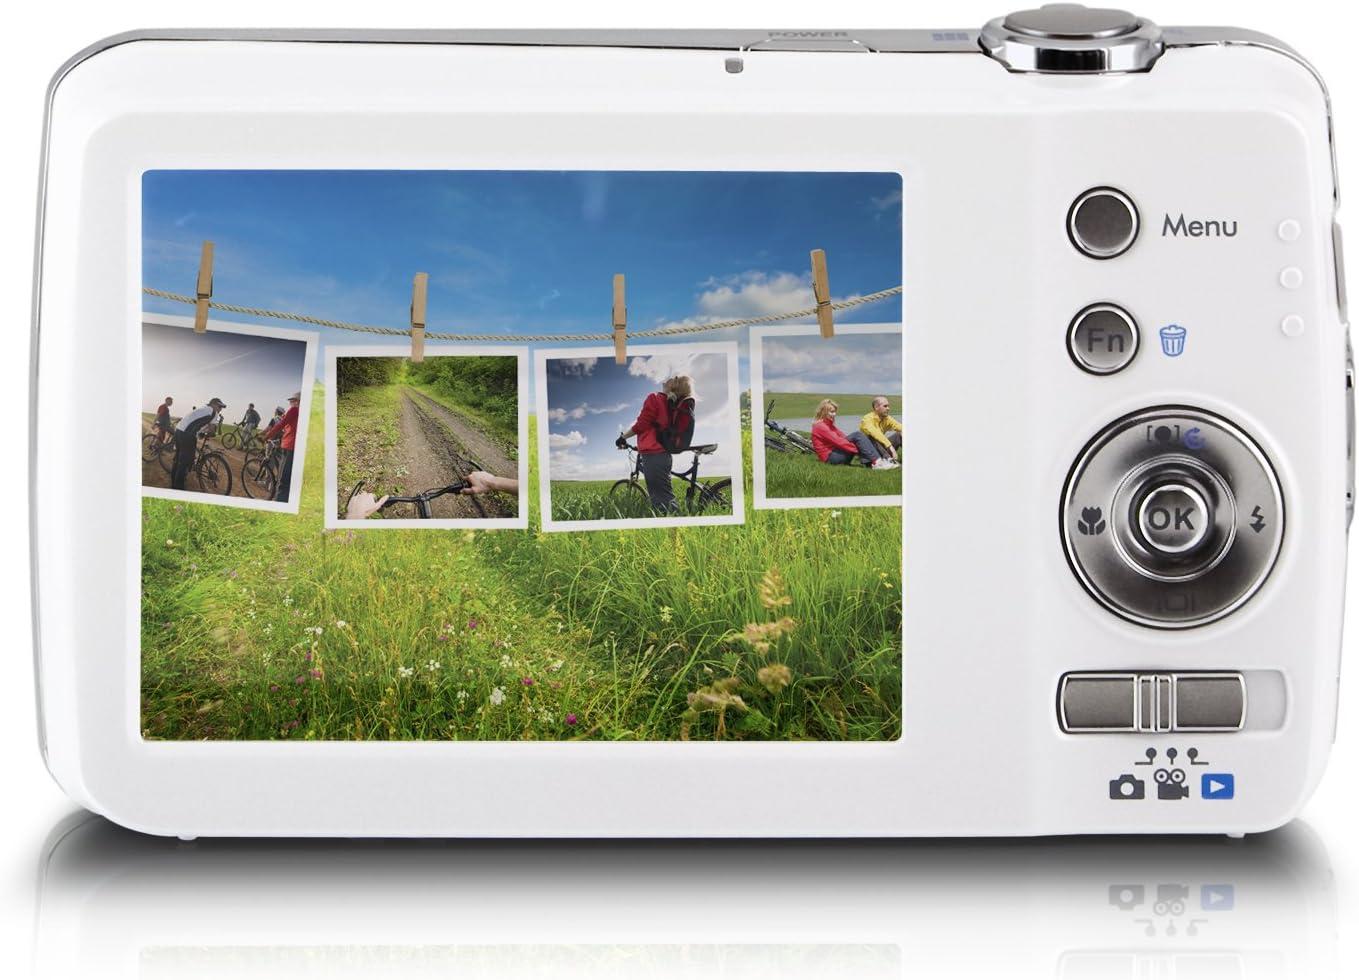 Praktica Luxmedia 16 Z51 Digitalkamera 2 7 Zoll Weiß Kamera